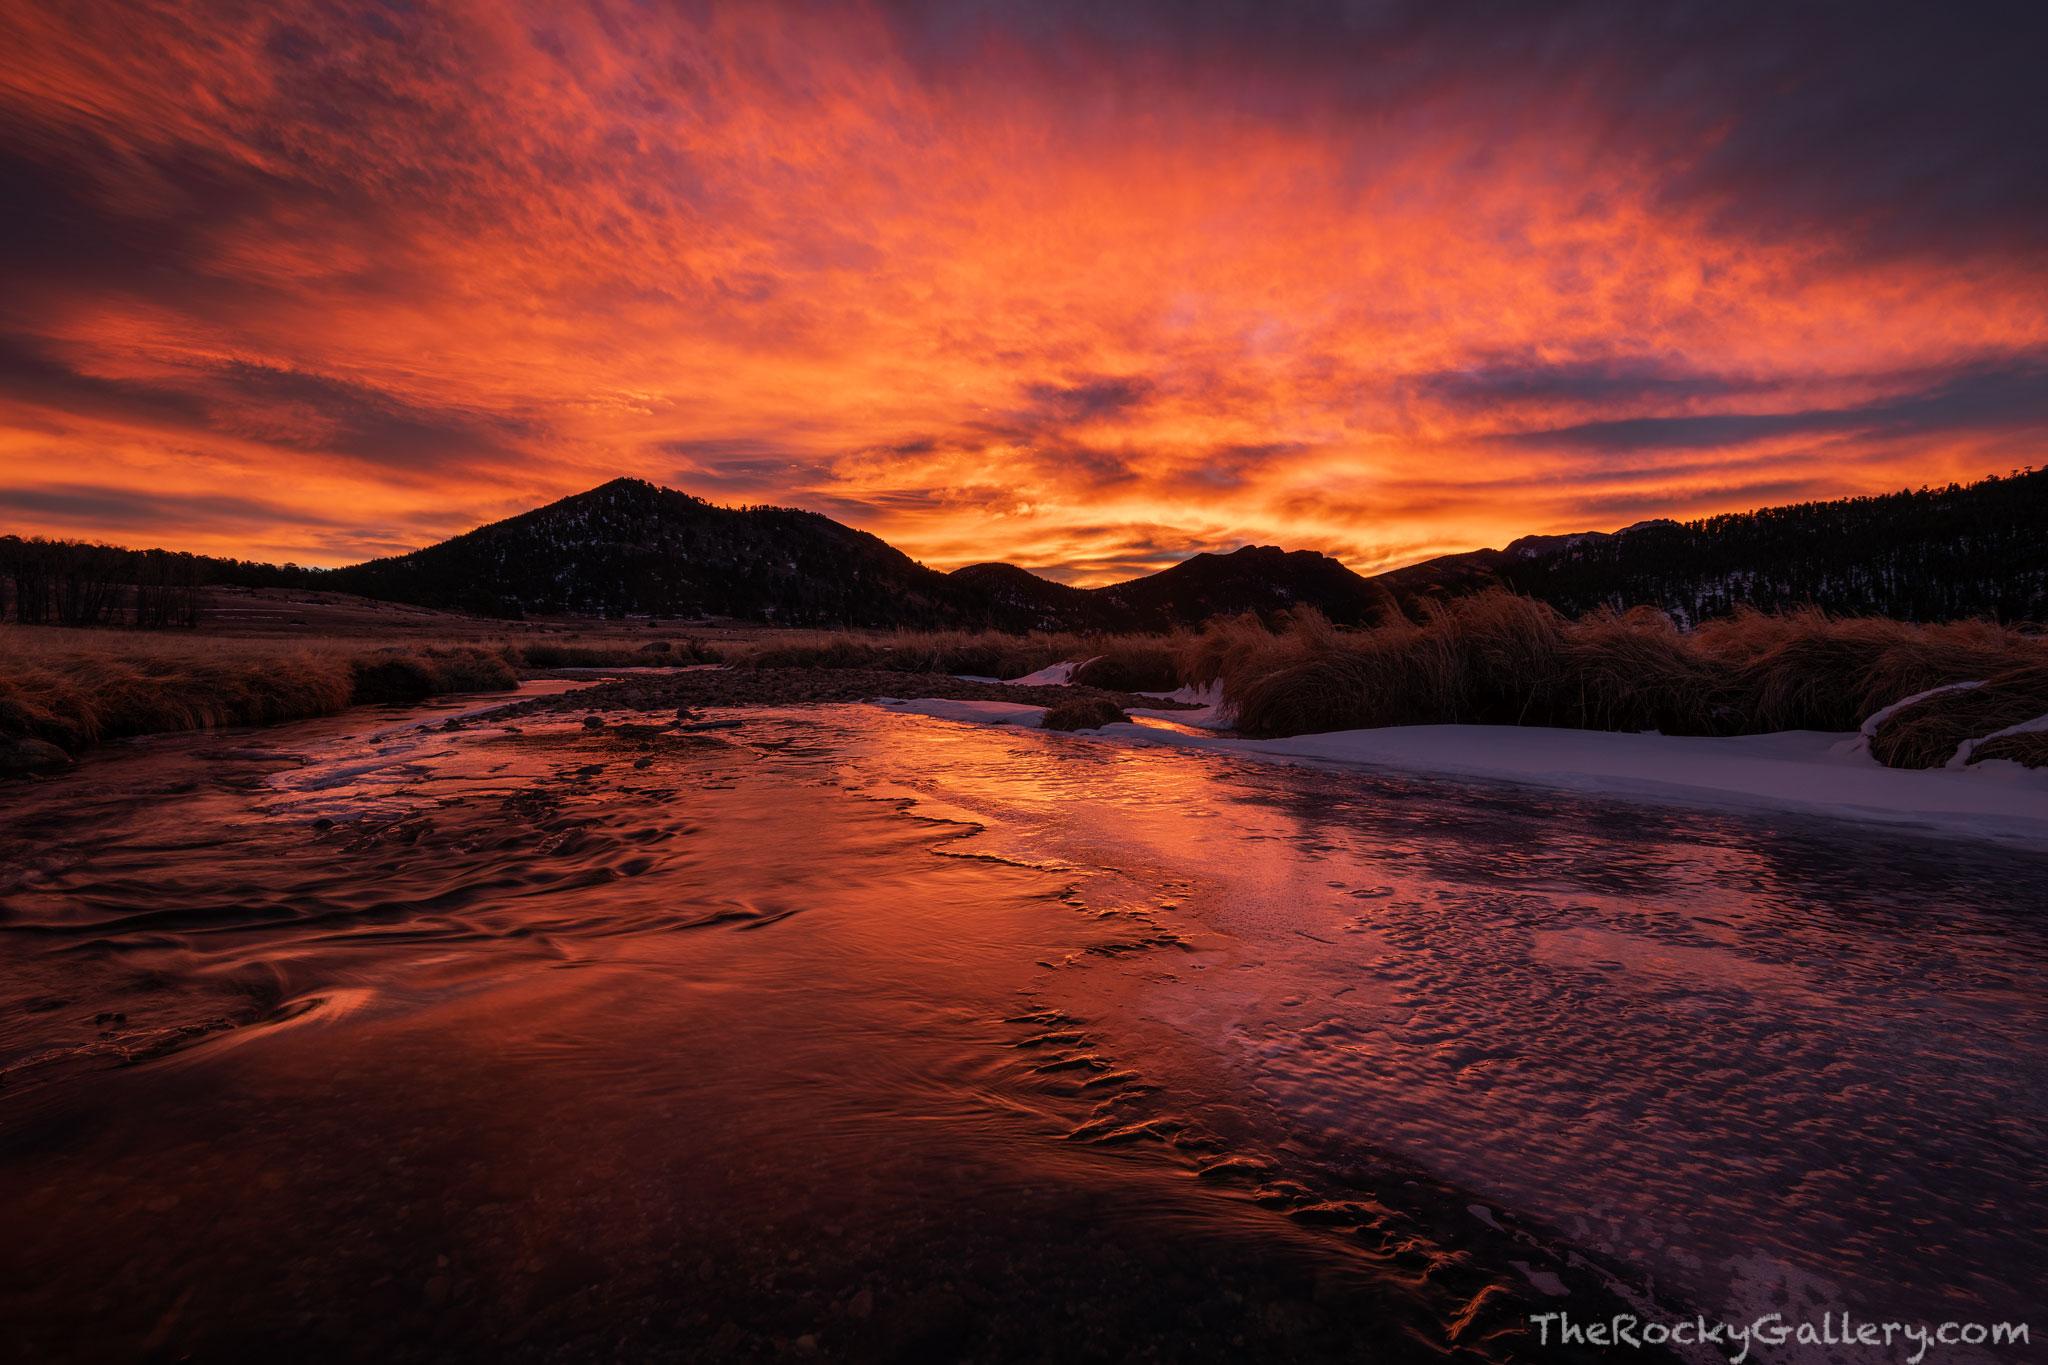 Big Thompson River,Thanksgiving,RMNP,Bear Lake Road,Colorado,Sunrise,November,Rocky Mountain National Park,Estes Park,Landscape,Photographer,Eagle Cliff Mountain, photo